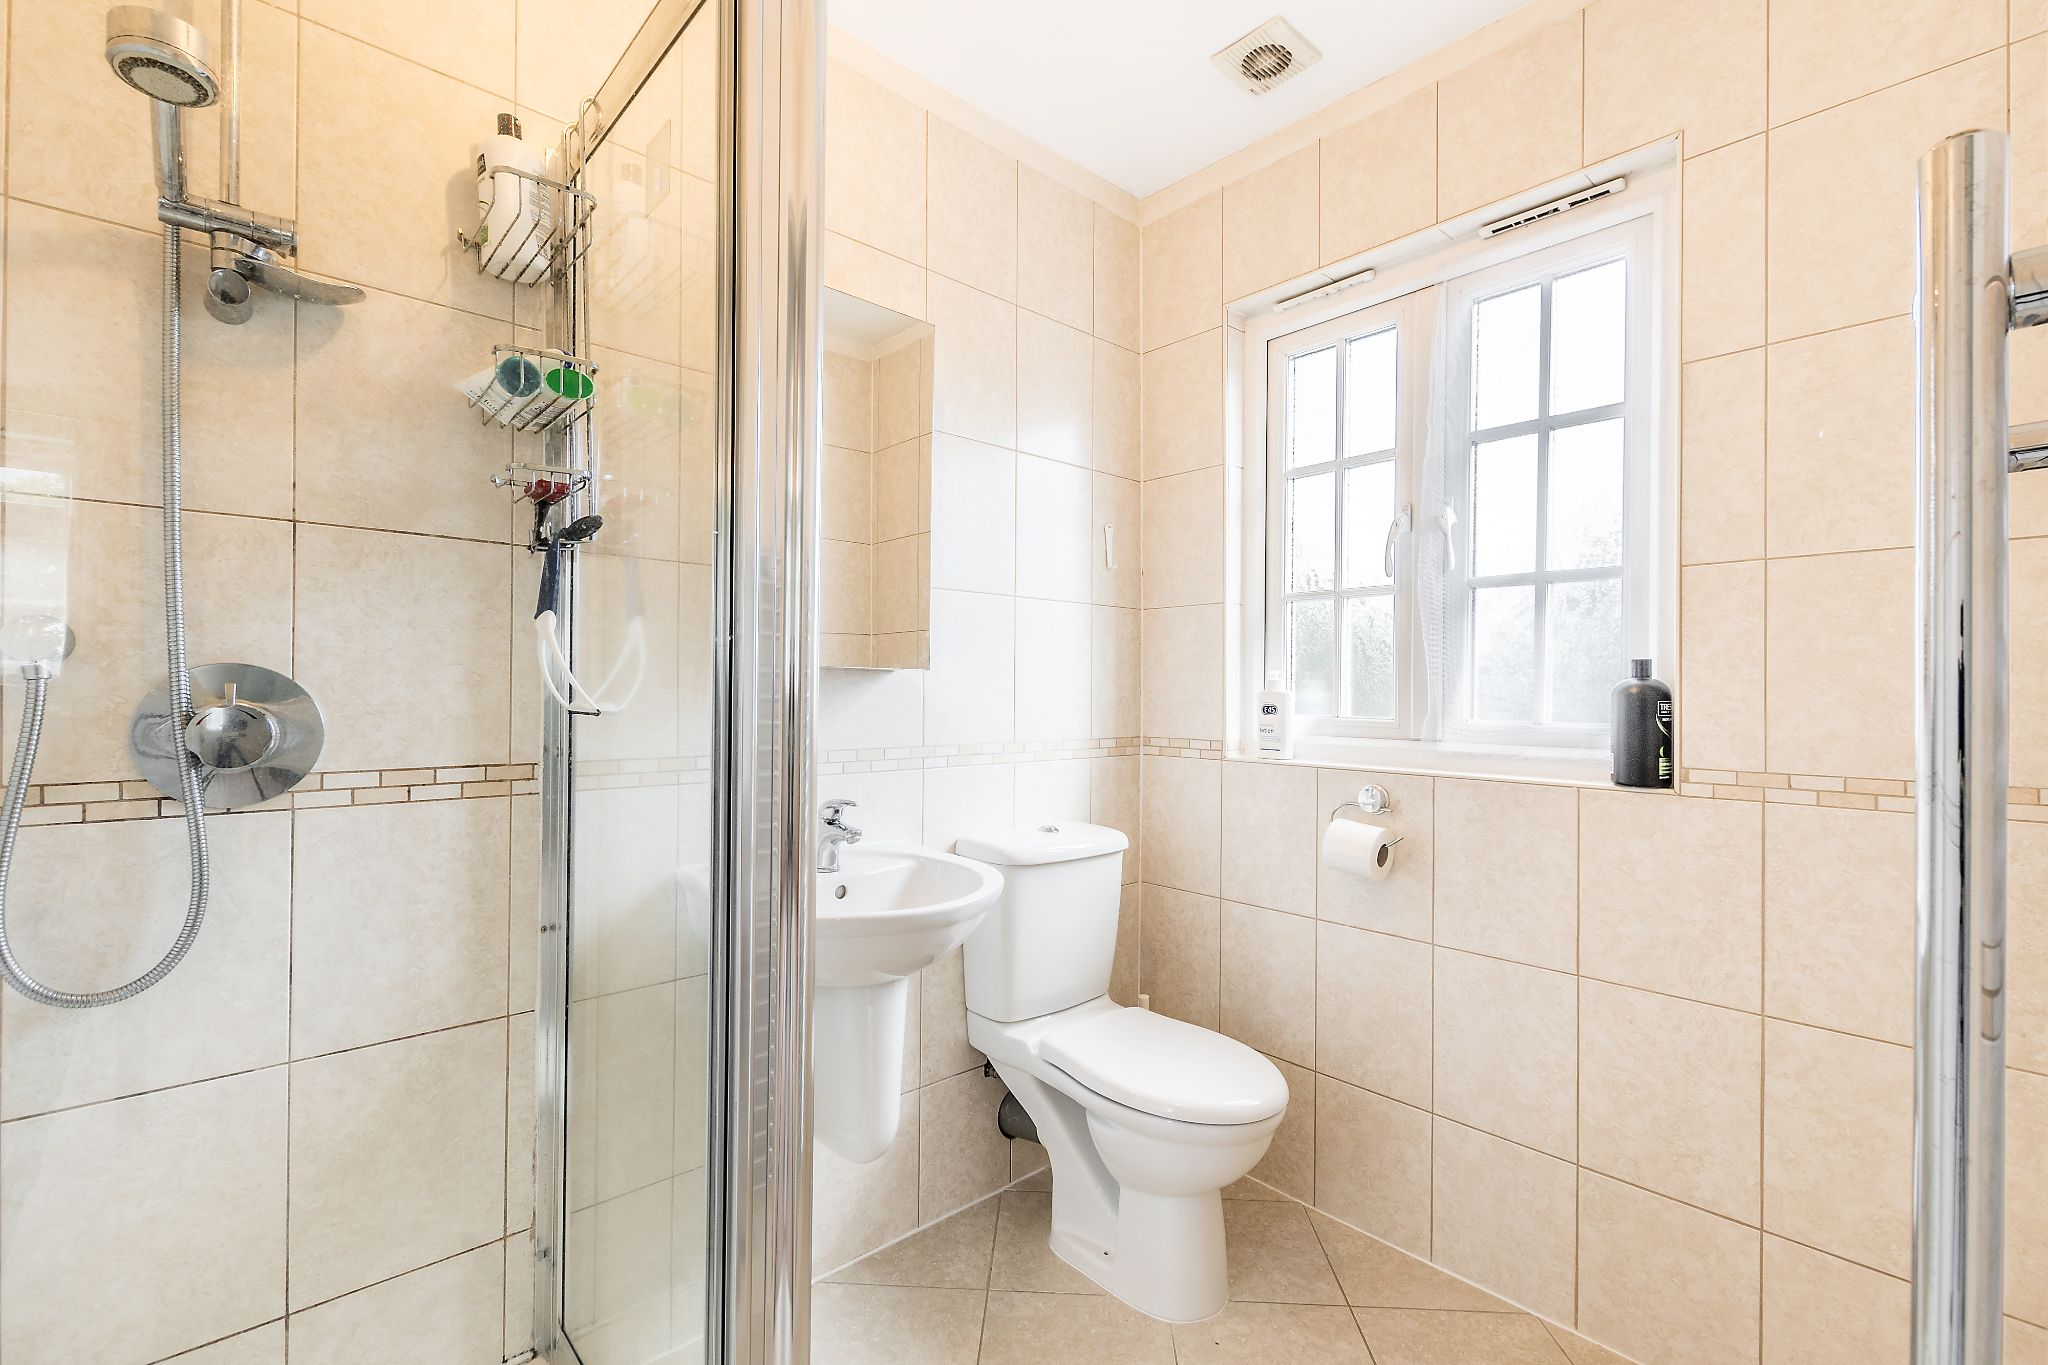 3 bedroom detached bungalow For Sale in Sevenoaks - Photograph 11